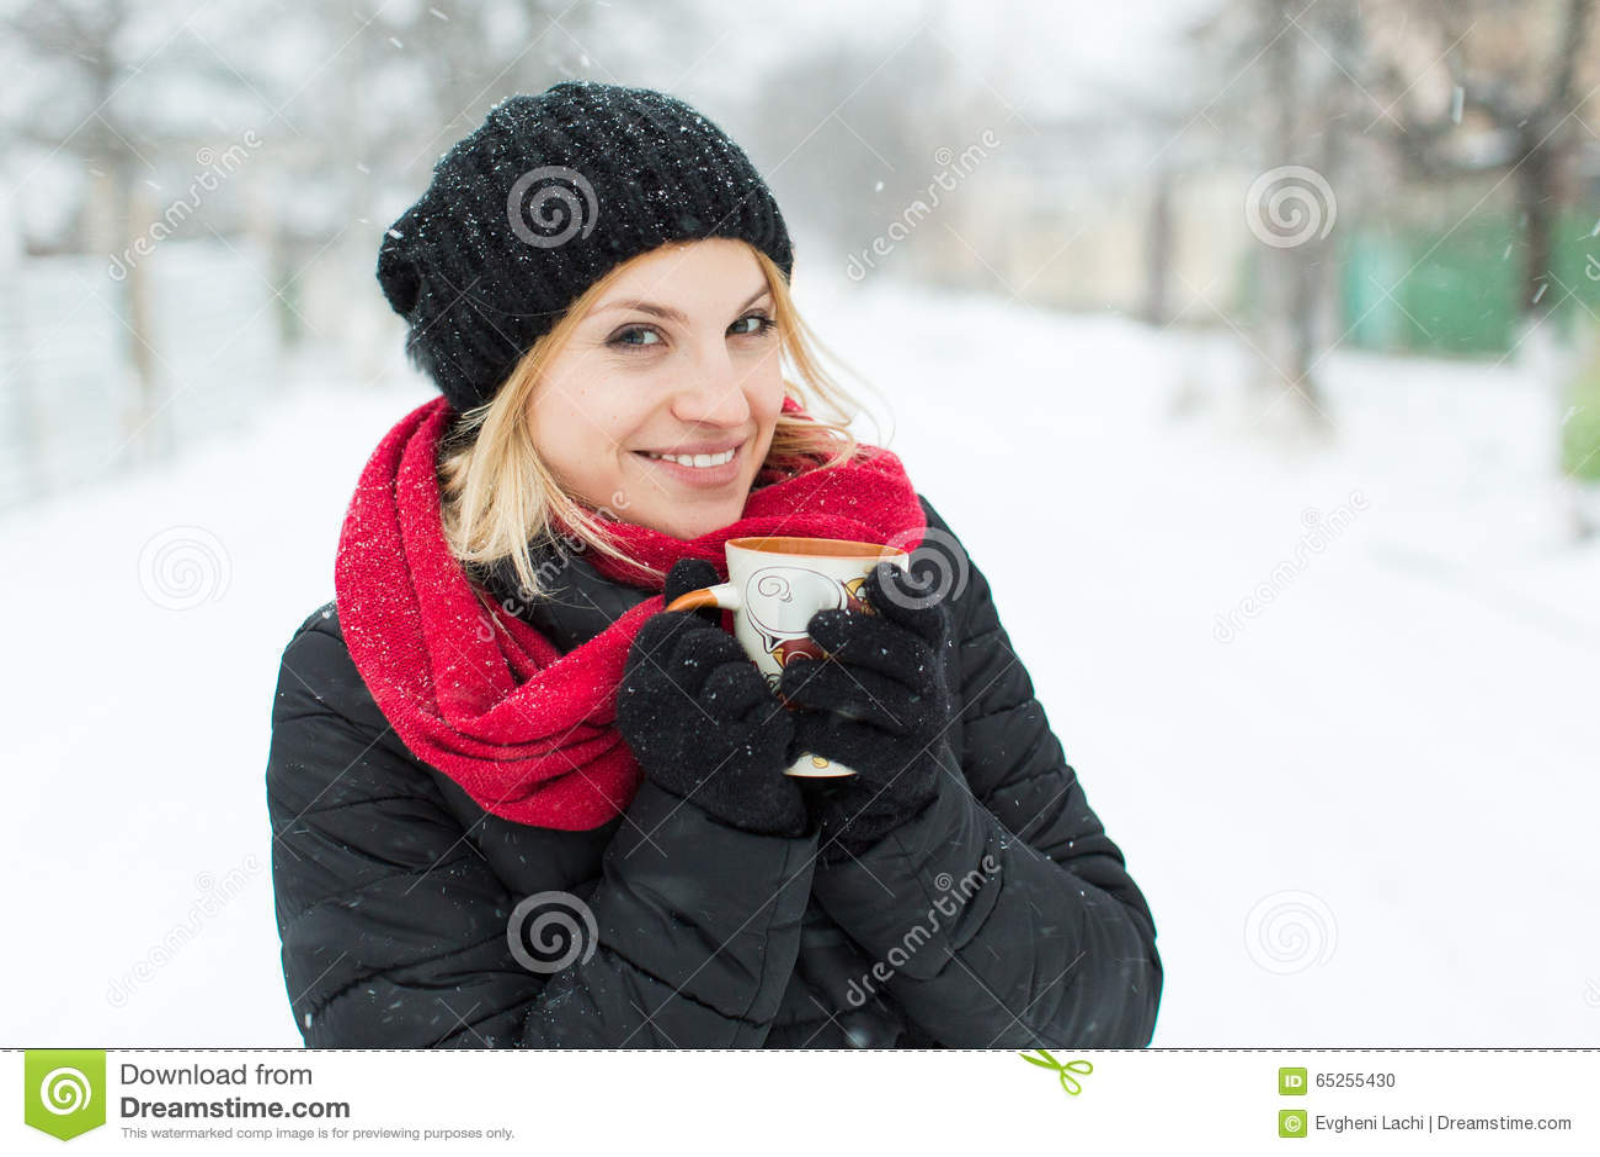 Winter Girl Drinking Hot Tea Stock Photo - Image of camera, close